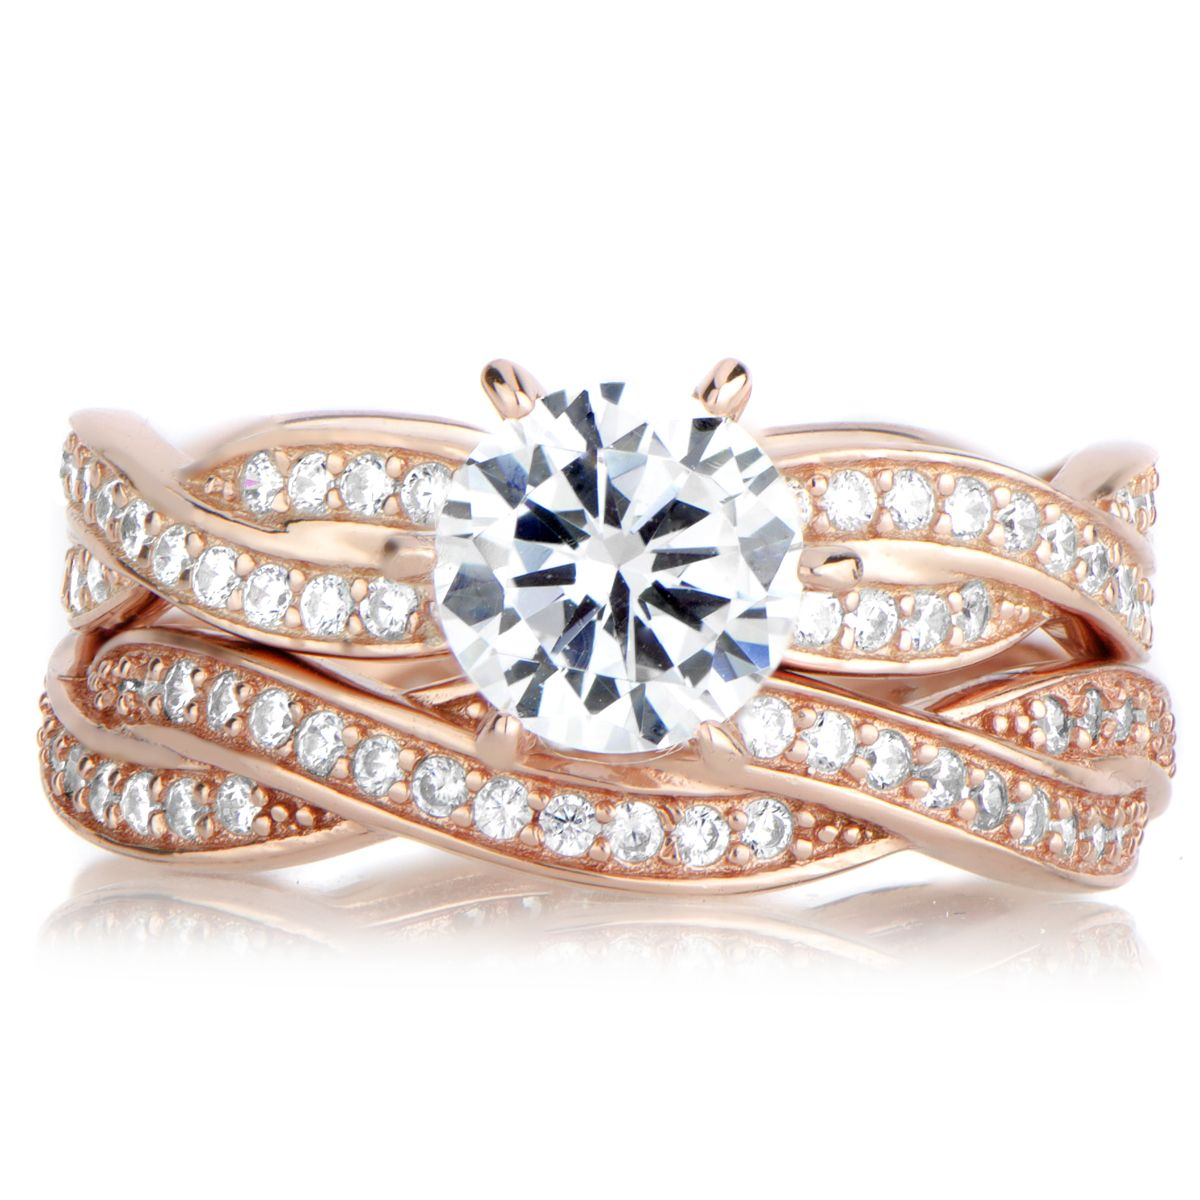 Devera's Rose Gold CZ Twisted Wedding Ring Set Rose gold